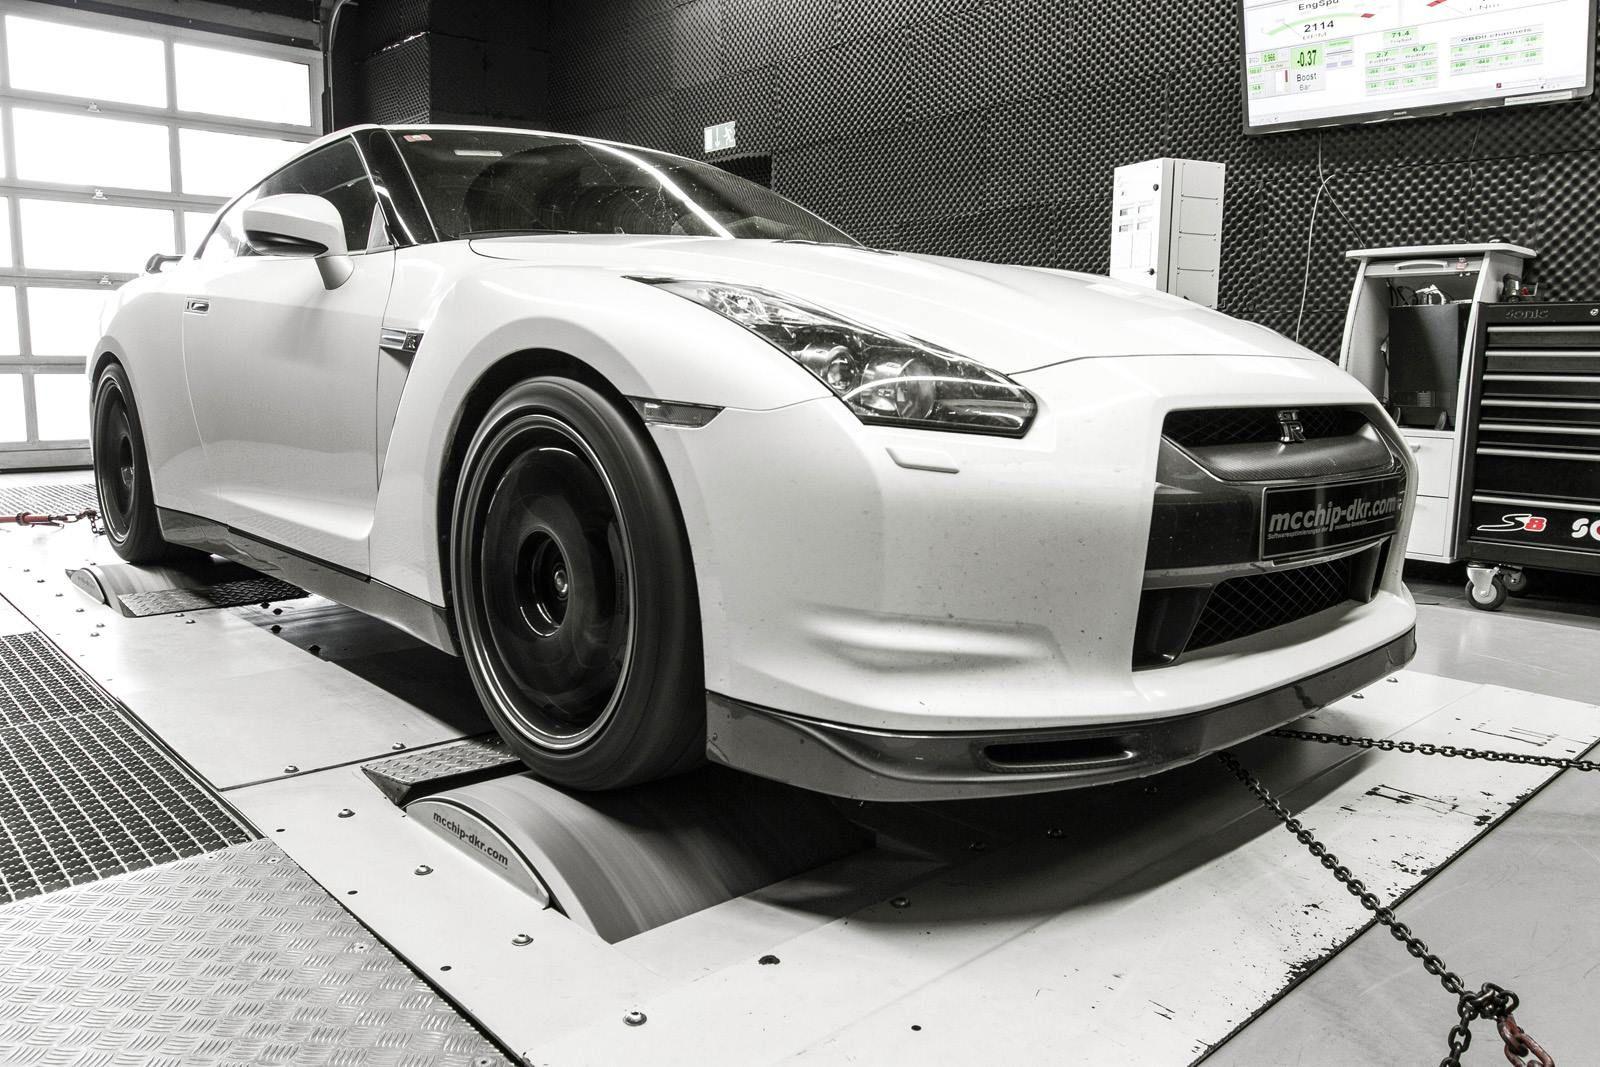 Mcchip-DKR Stage 3 Nissan GT-R SpecV 3.8 V6 Bi-Turbo emits 743PS power  (8)